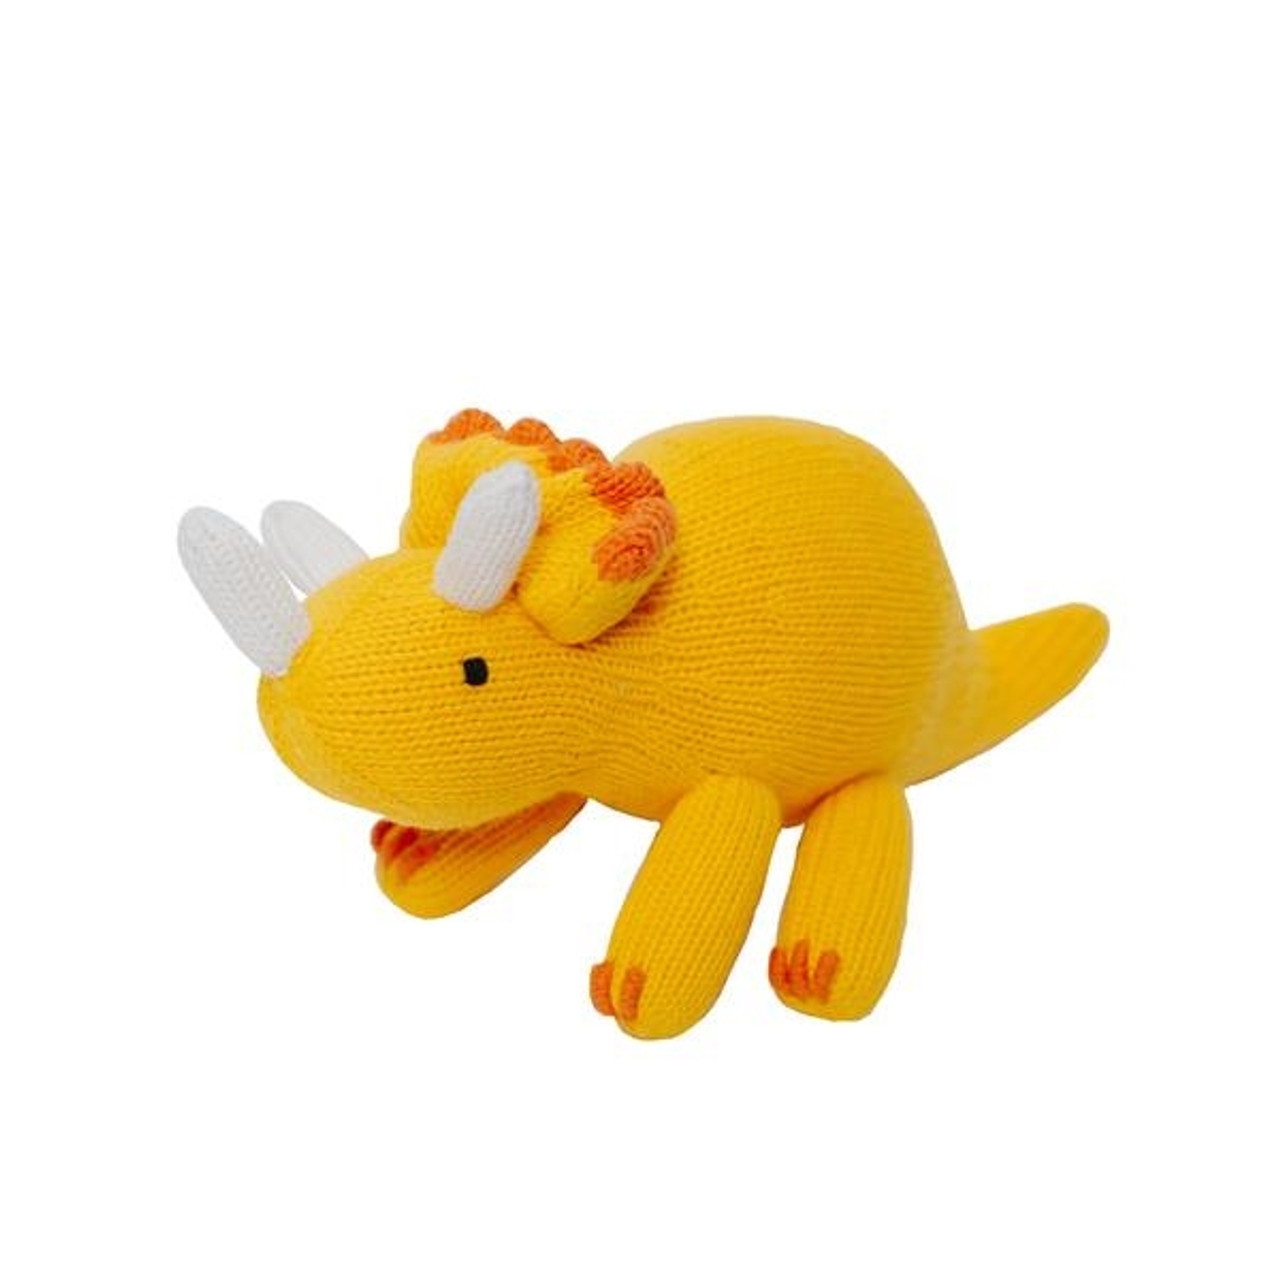 Handmade Dinosaur Toy - Triceratops